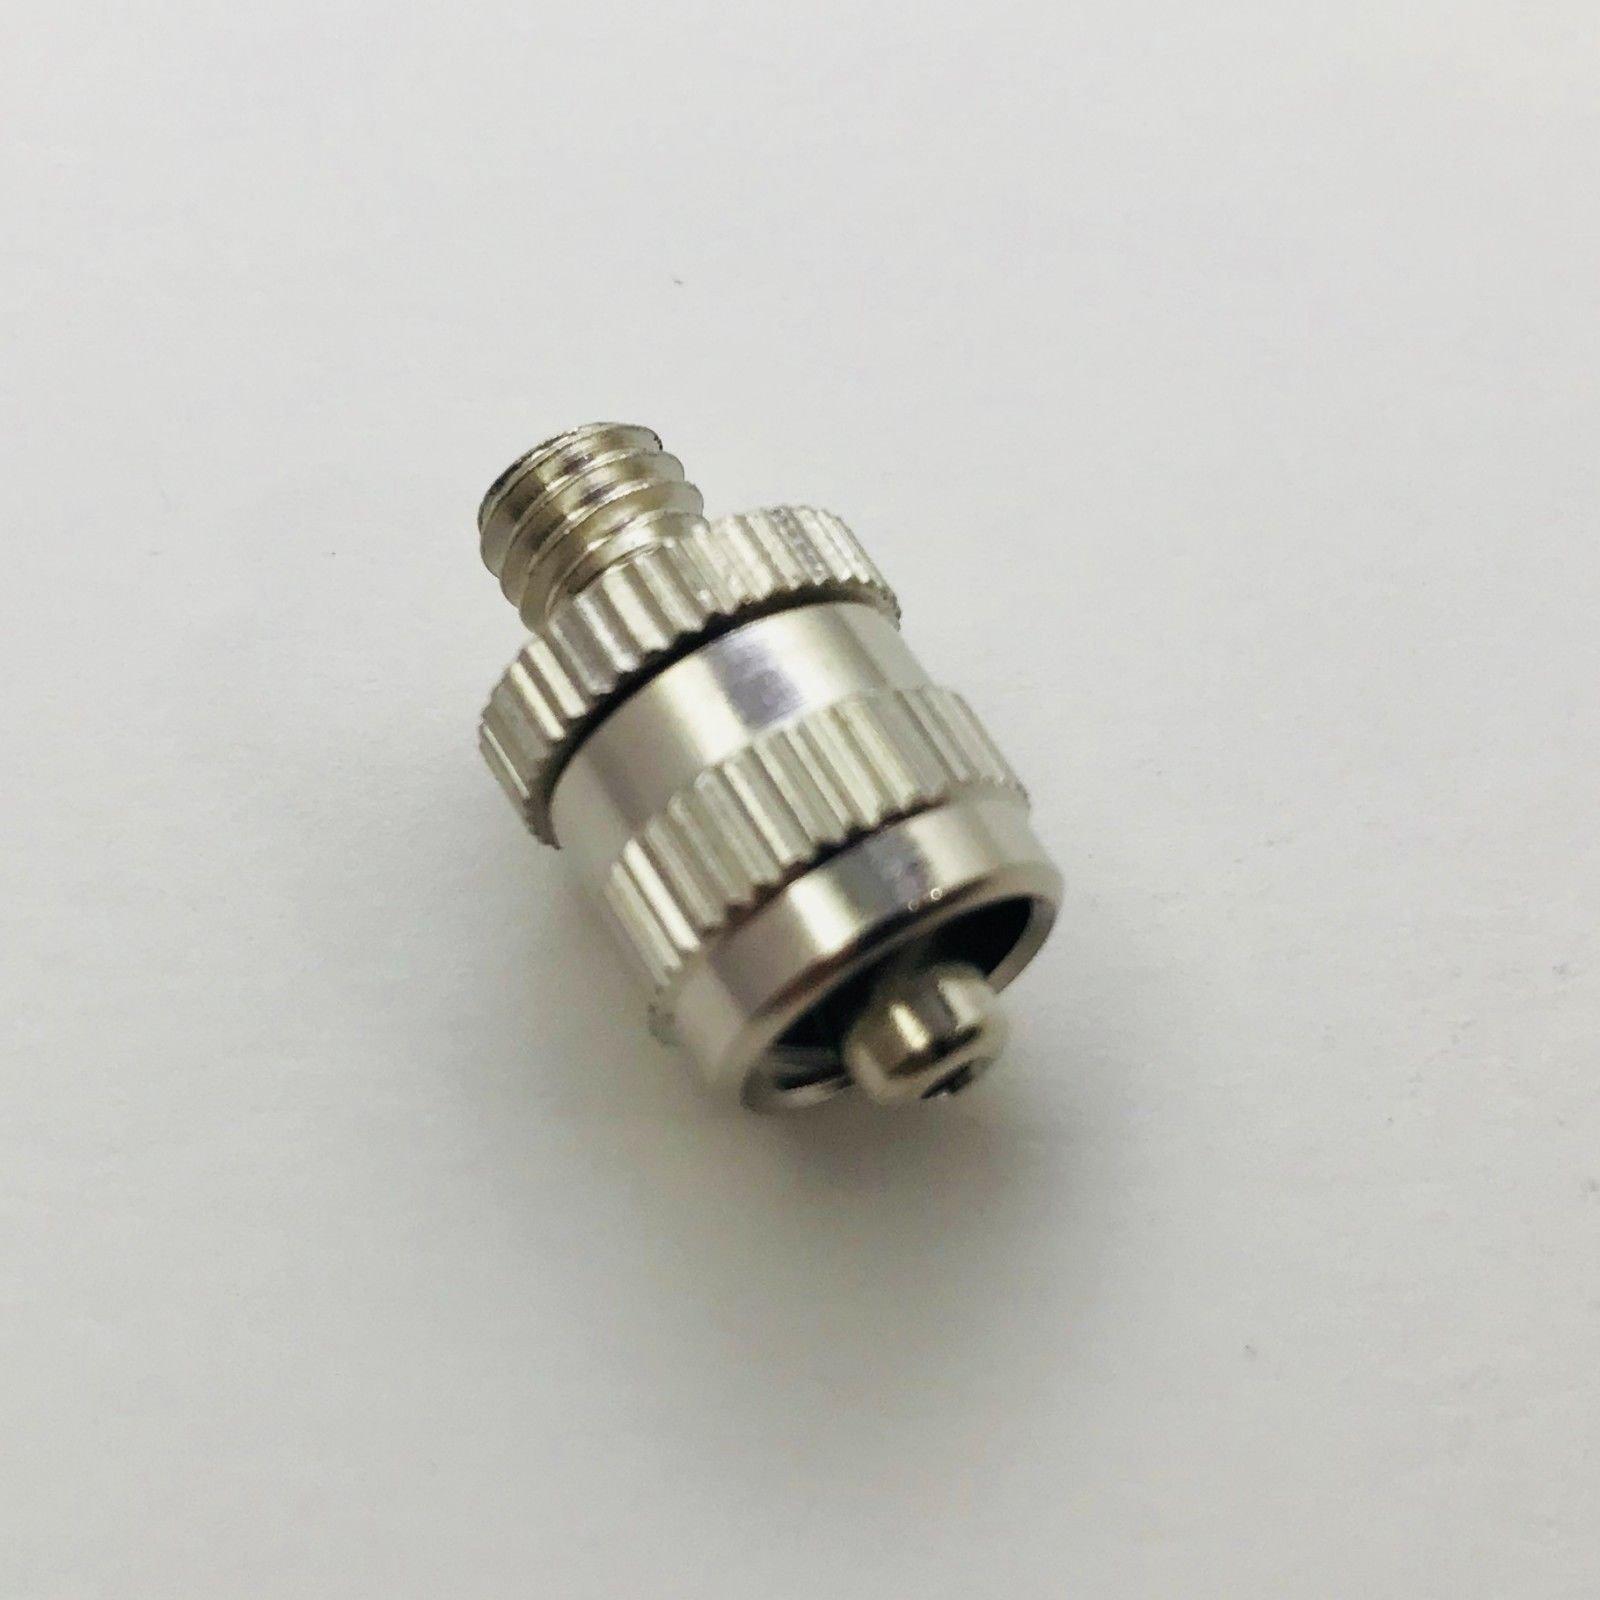 Metal Male Luer Lock Syringe Fitting to Metric M5 M5X0.75 Male (2 Units)